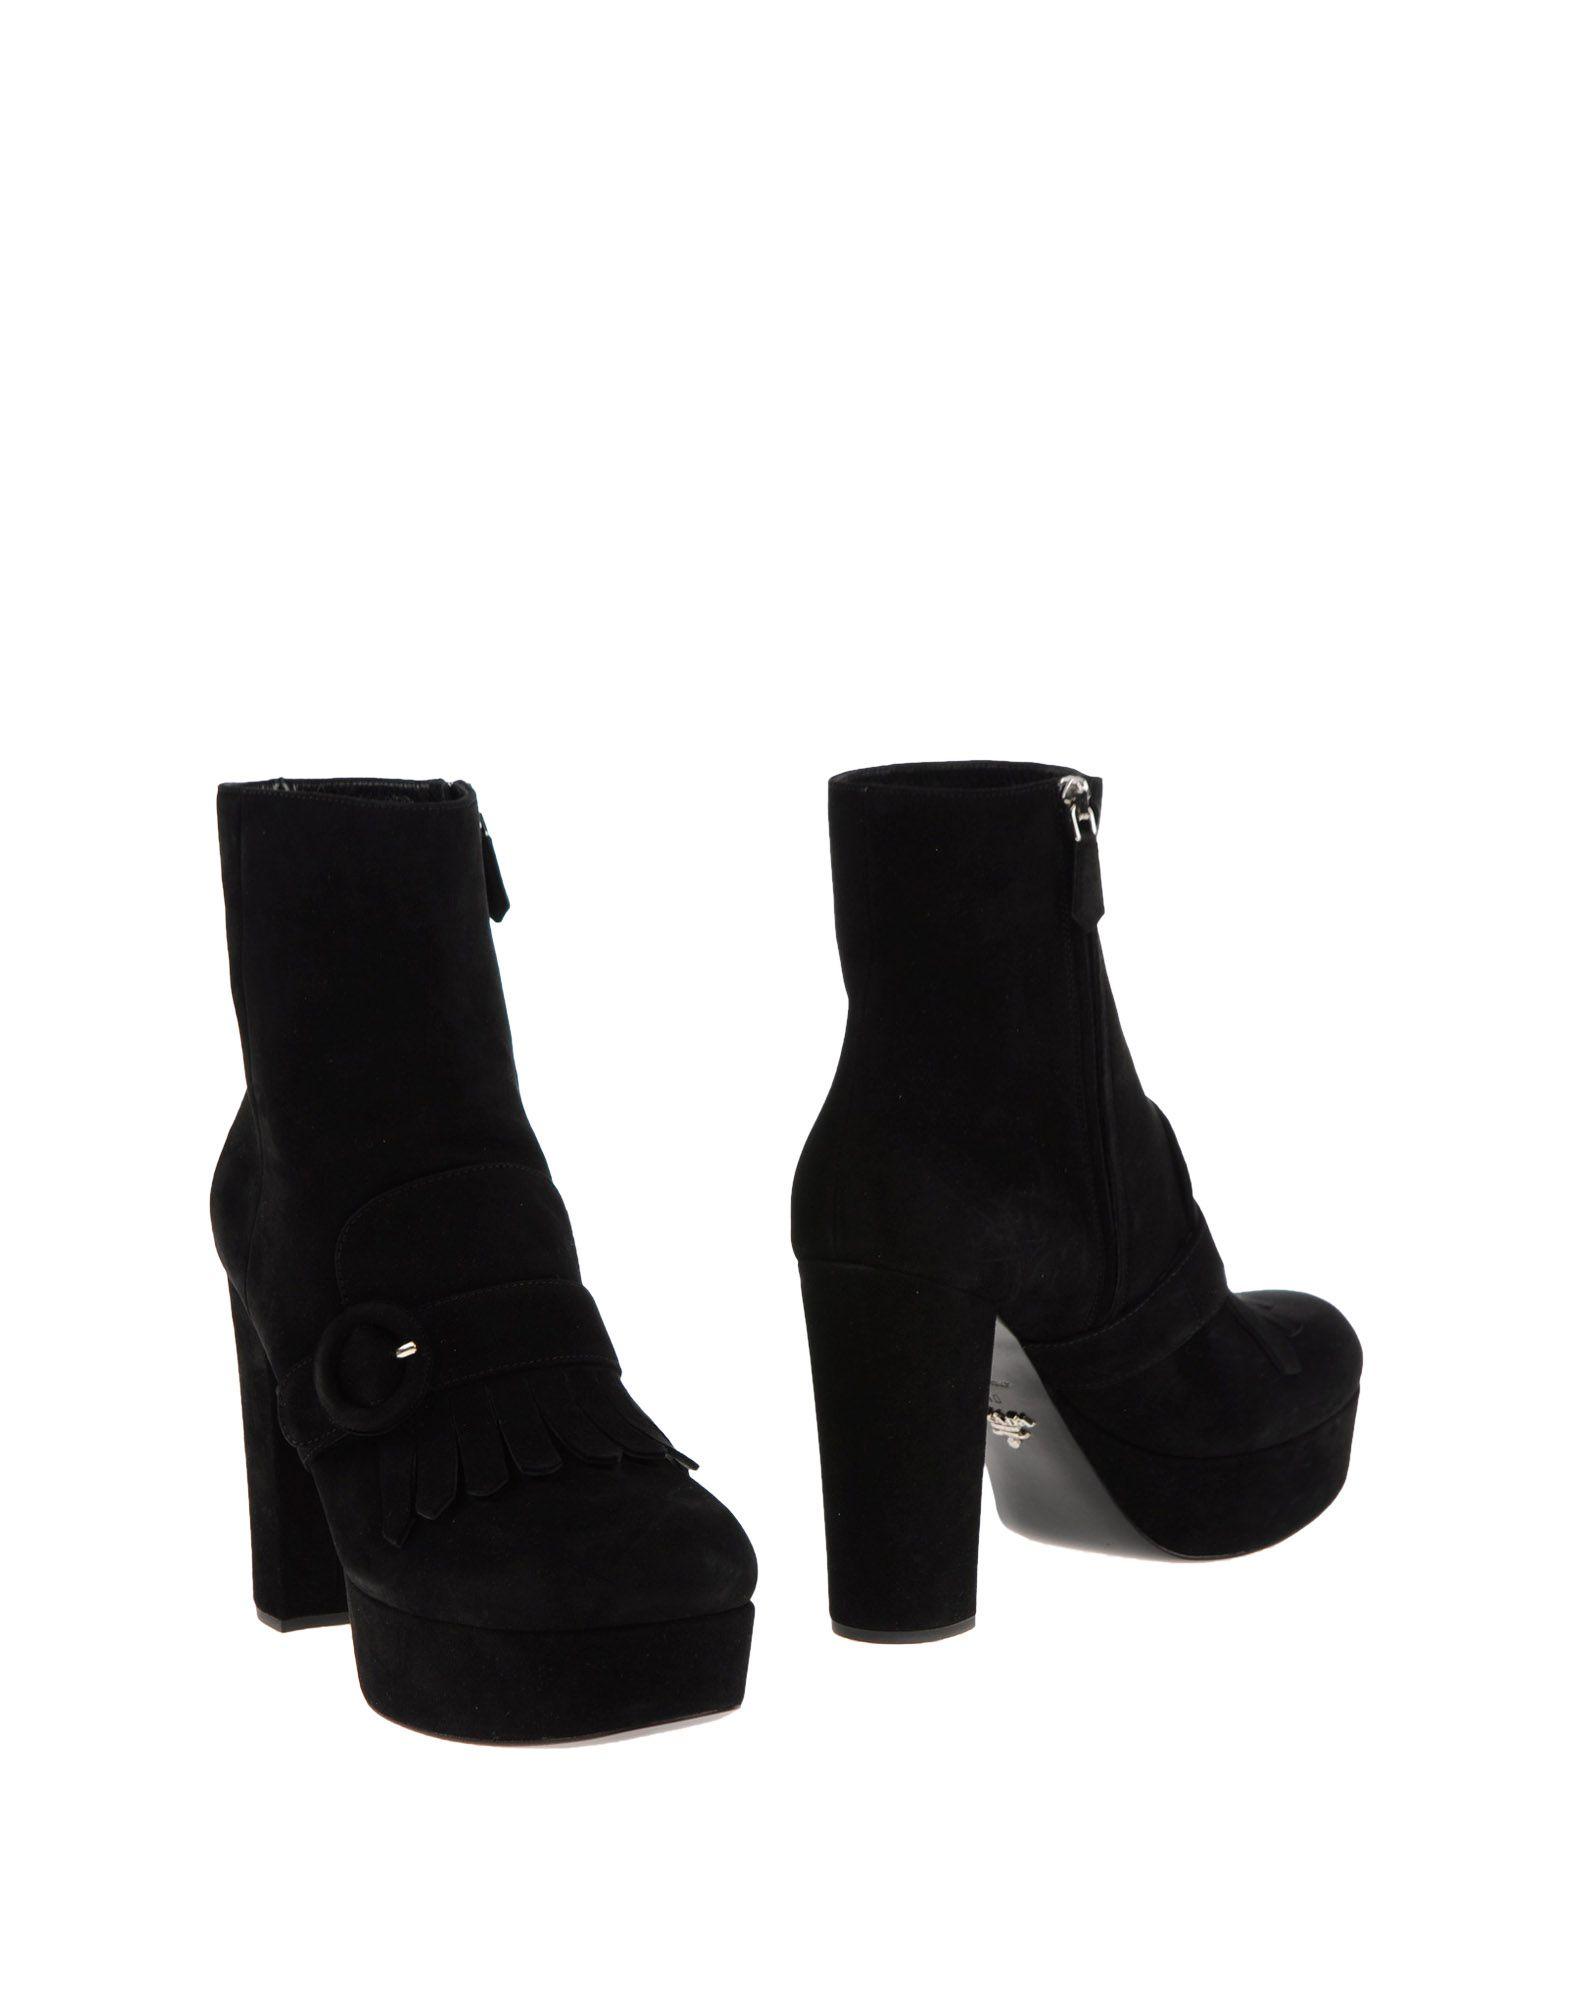 Prada Ankle Boot - Women on Prada Ankle Boots online on Women  United Kingdom - 11244776IO f245a5